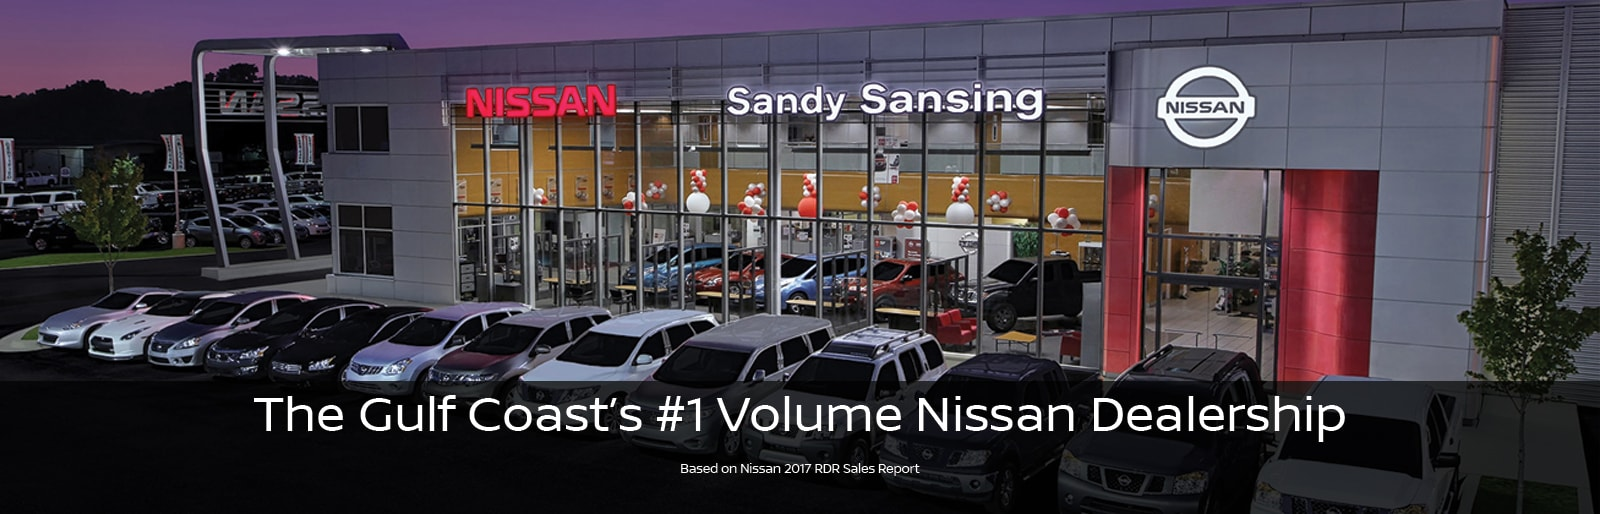 dealer nissan s downeynissan downey lease hp california murano volume